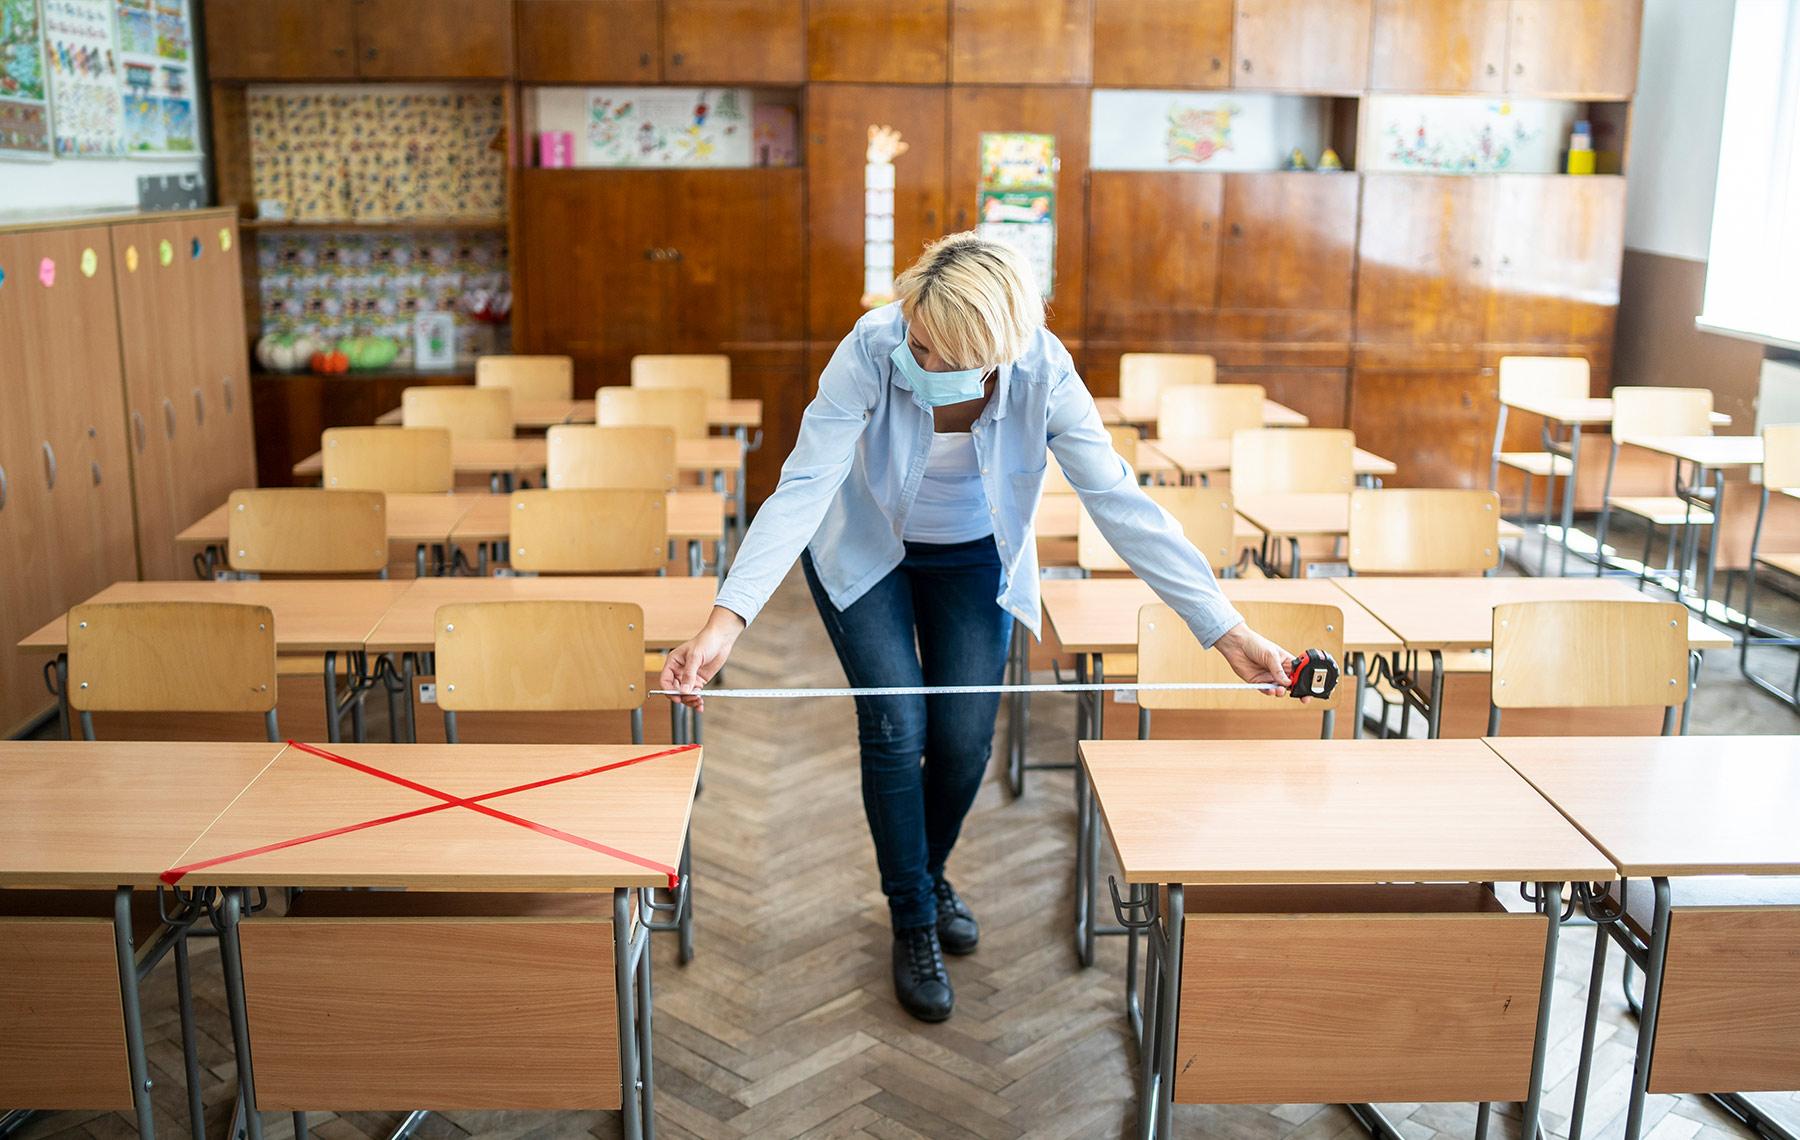 Classroom back to school